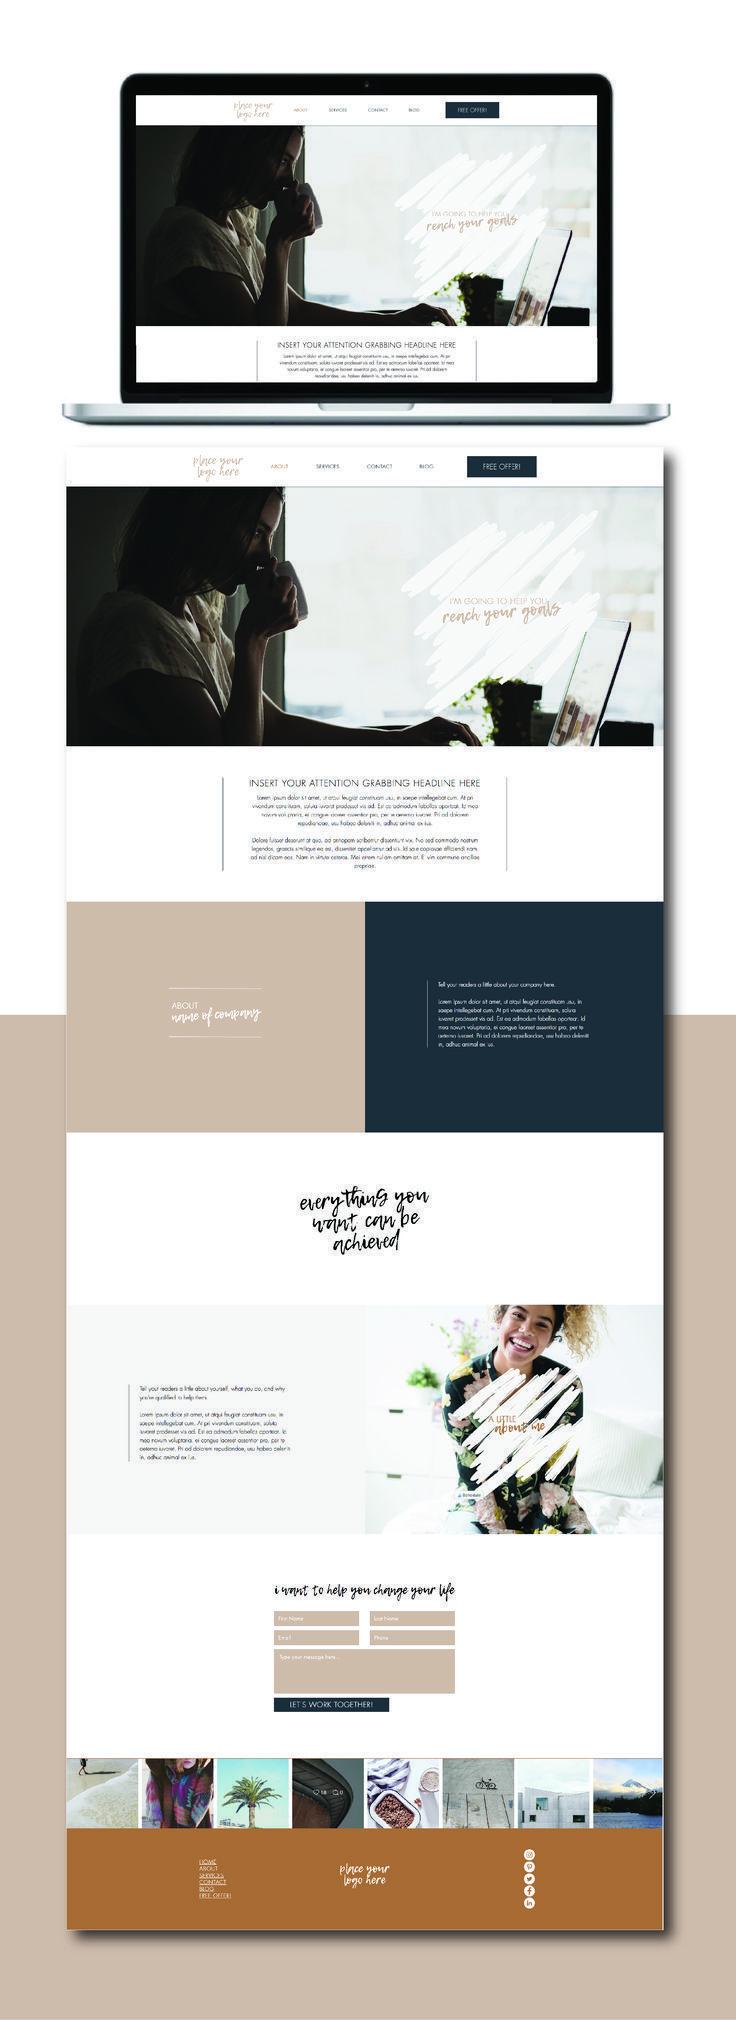 Website Design Website Template Web Design Wix Website Ideas Diy Your Own Websit Wix Website Templates Wix Website Design Small Business Website Design